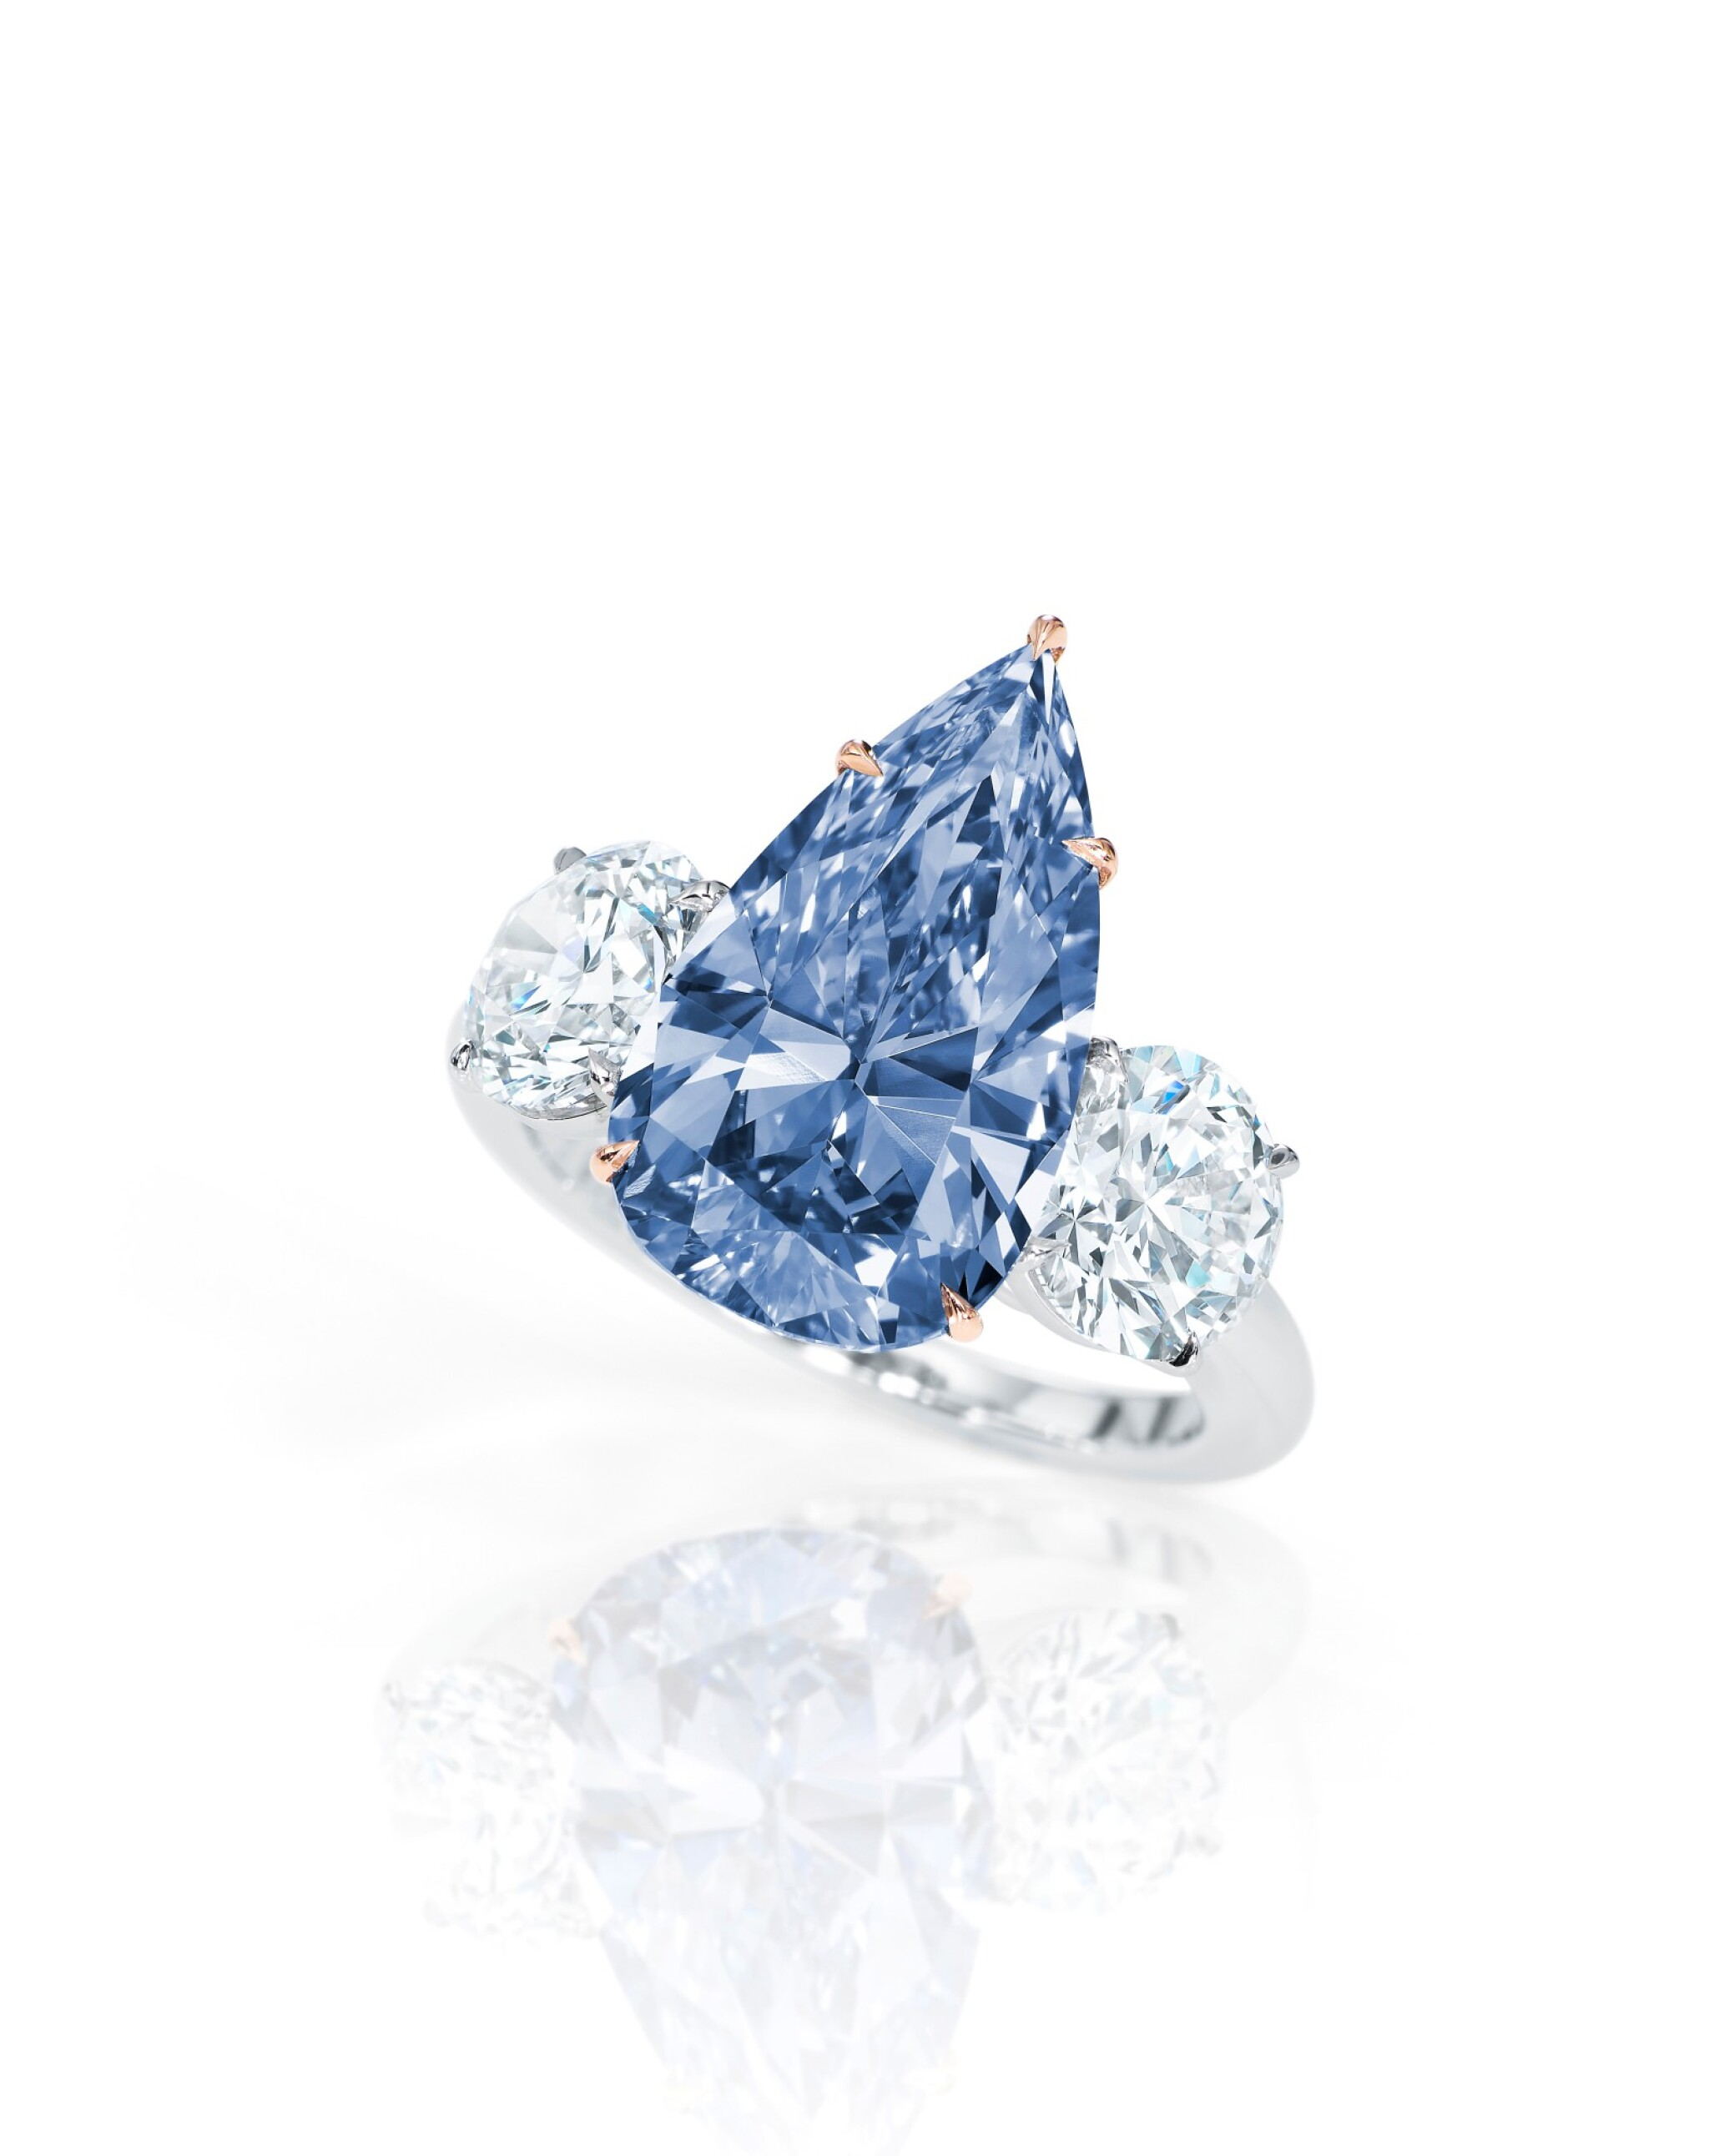 View 1 of Lot 1756. AN EXCEPTIONAL FANCY VIVID BLUE DIAMOND AND DIAMOND RING | 珍罕非凡 4.84卡拉 艷彩藍色 內部無瑕(IF)鑽石 配 鑽石 戒指.